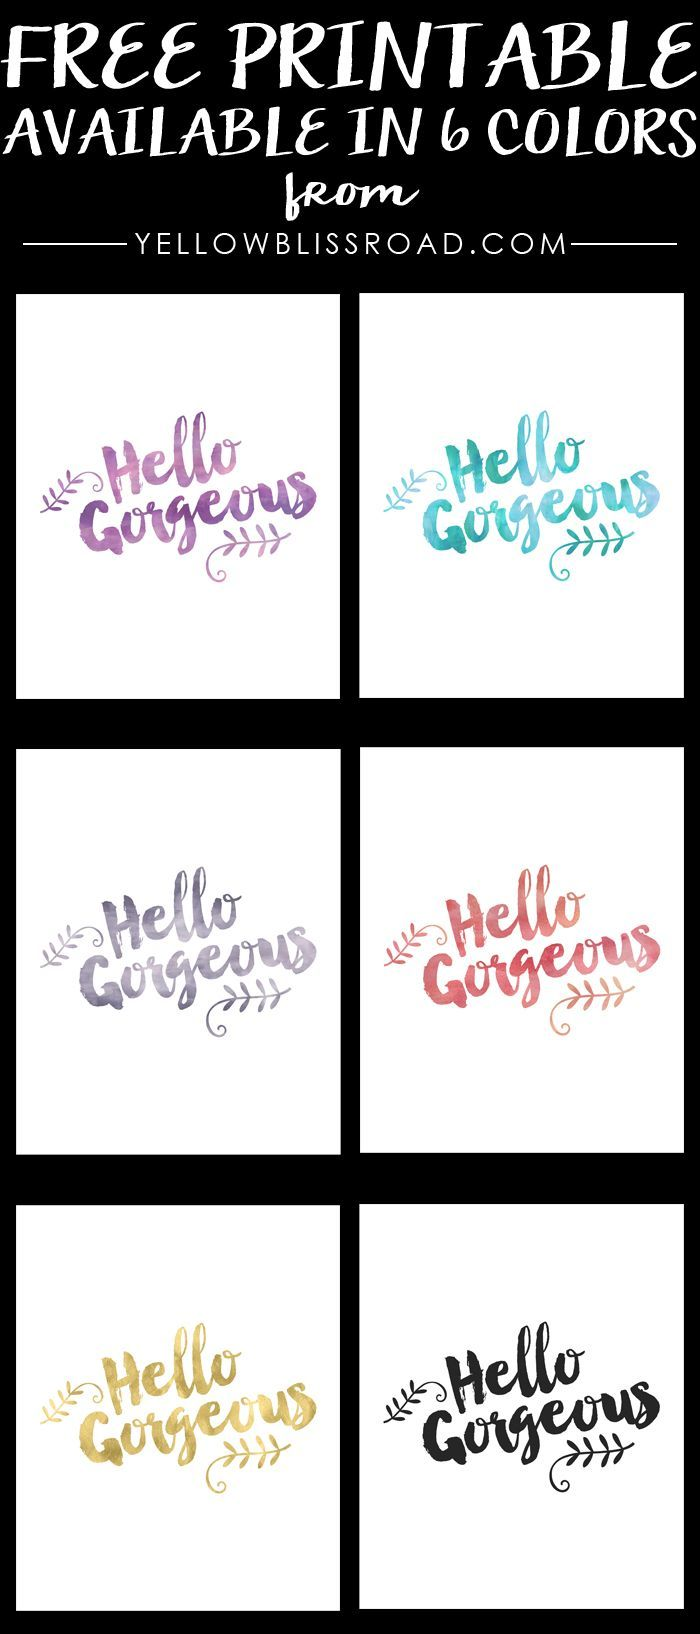 Hello Gorgeous Free Prinatbles in 6 Gorgeous Color Options